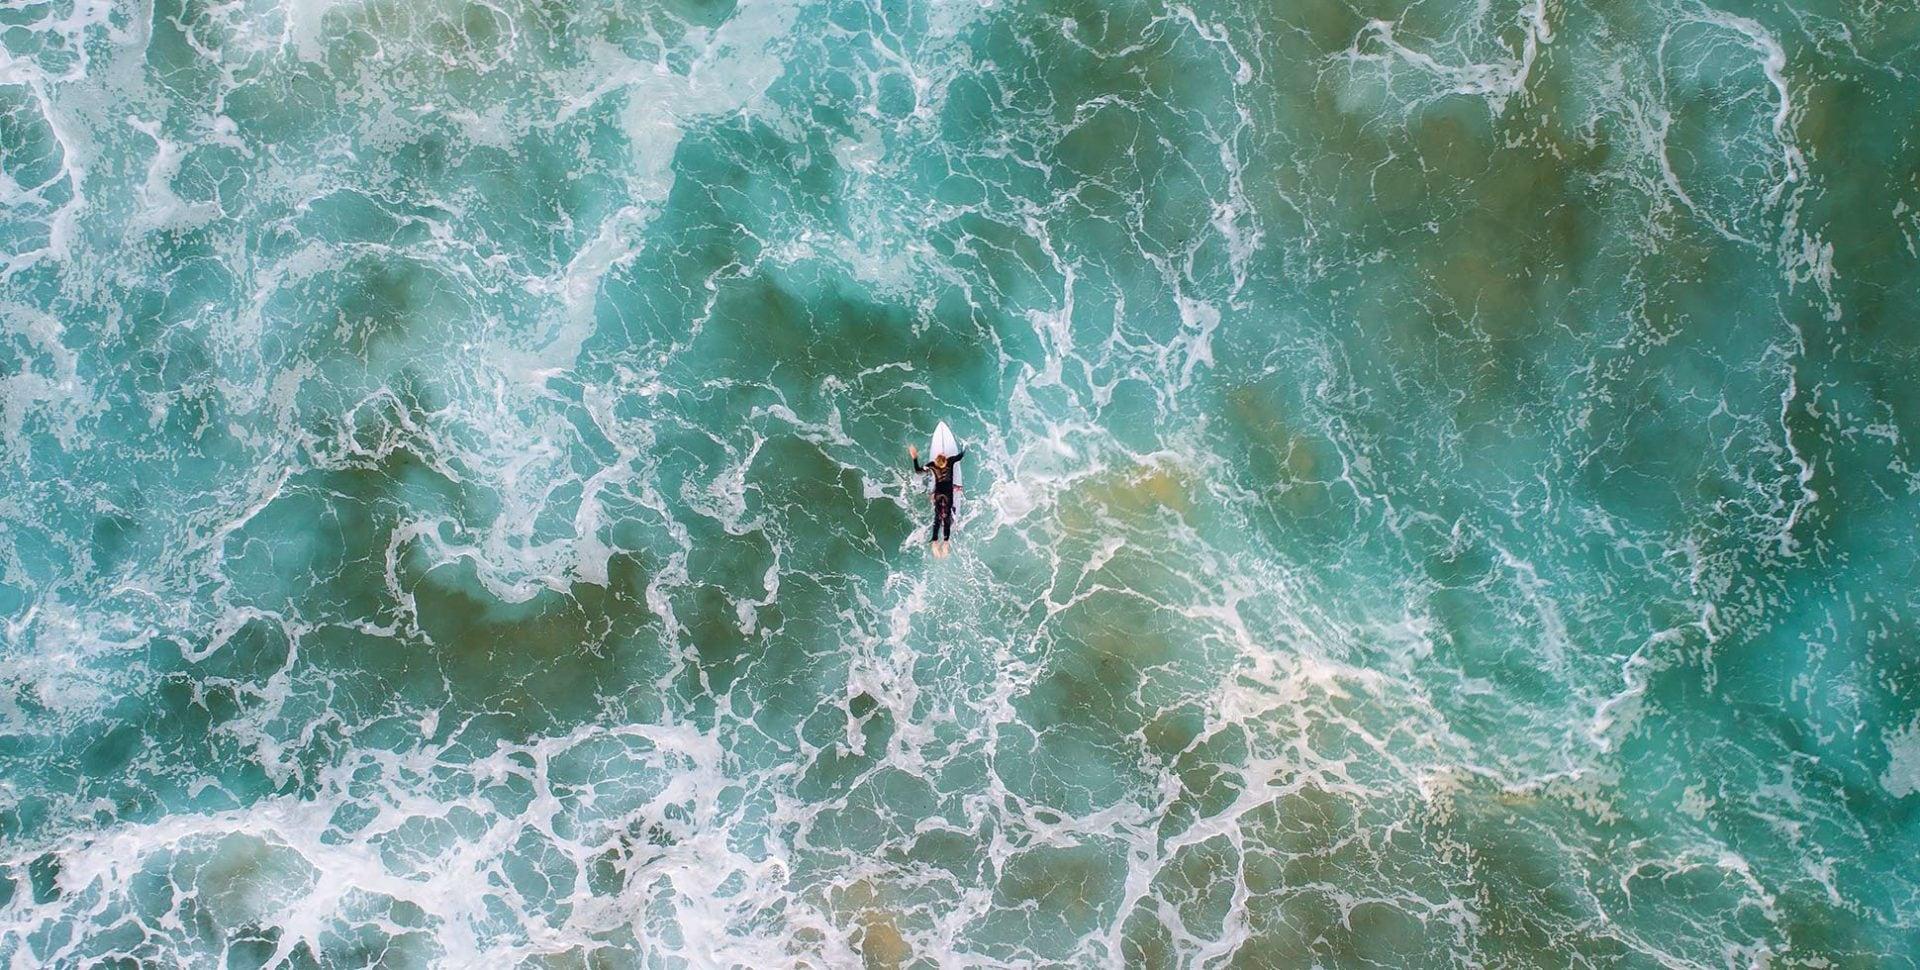 Surfer in rough seas